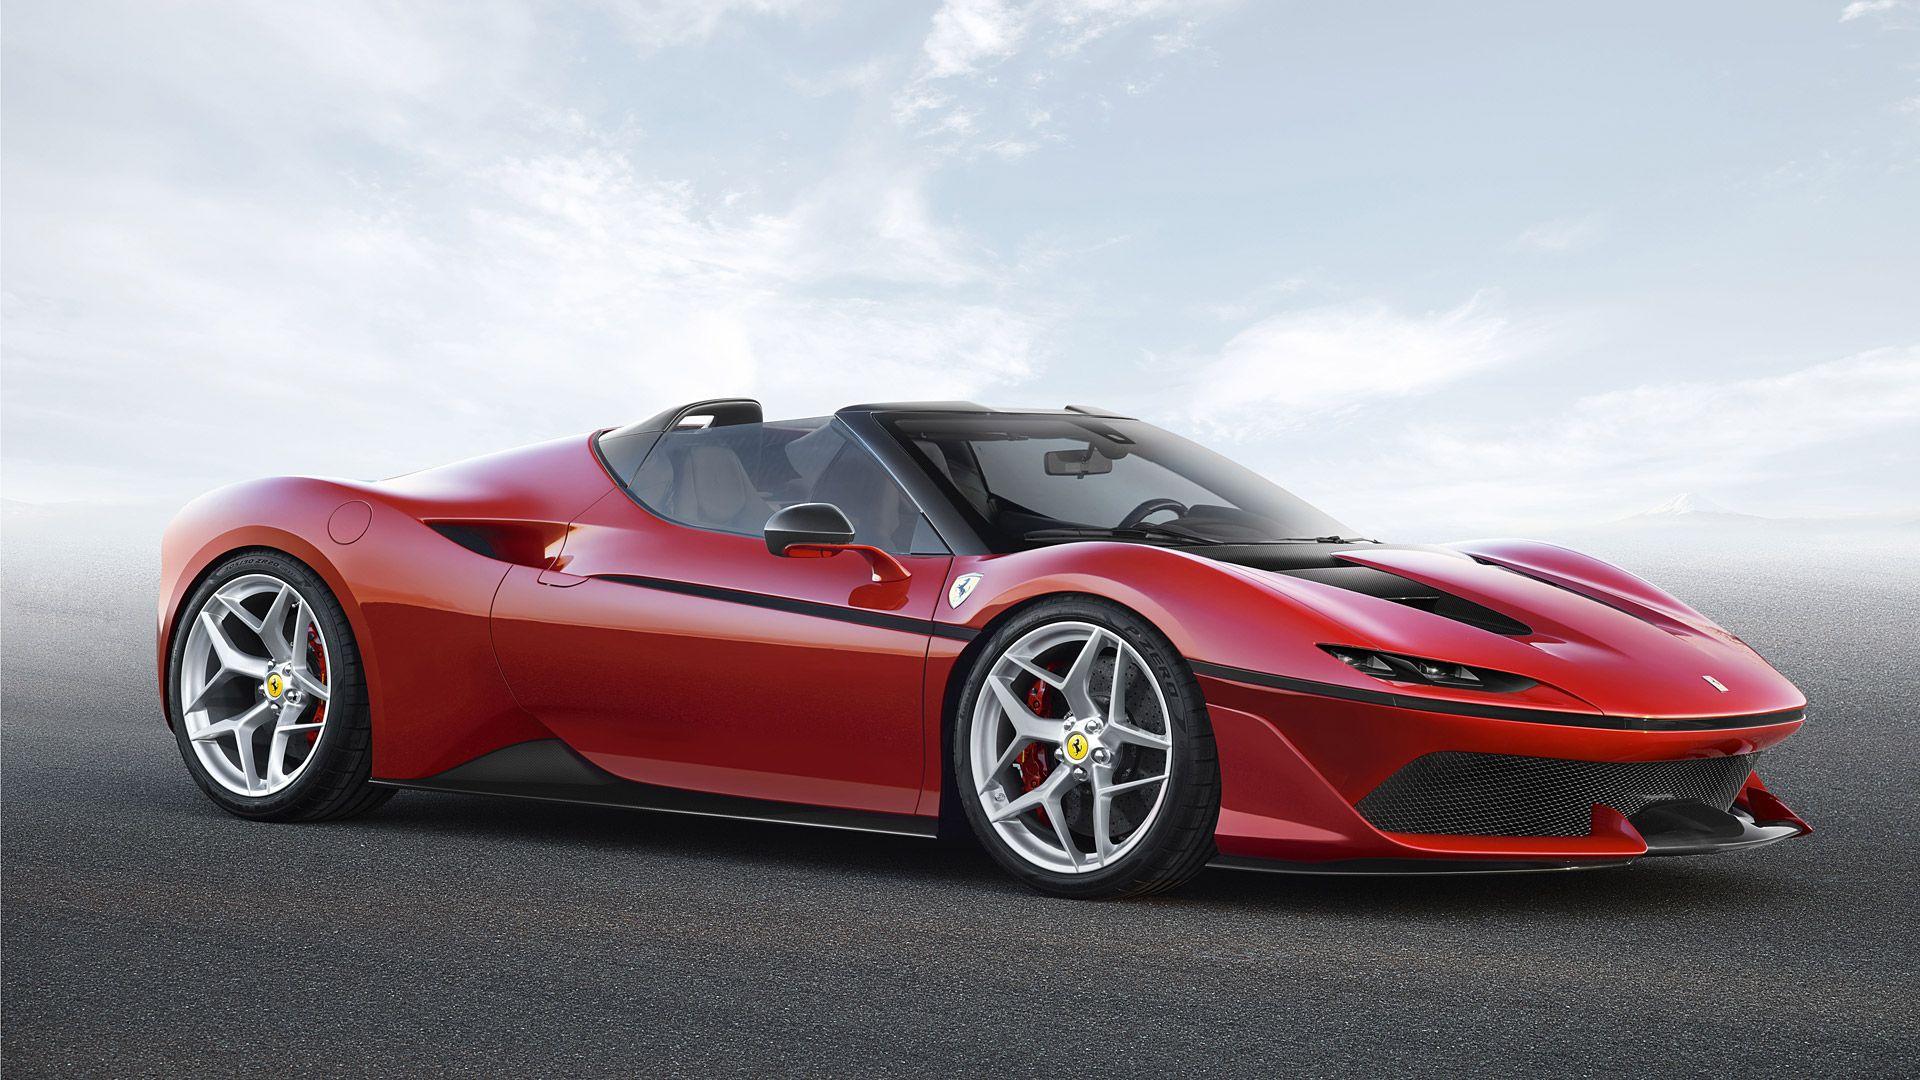 2016 Ferrari J50 Http Www Wsupercars Com Ferrari 2016 J50 Php Ferrari Car Super Cars Ferrari